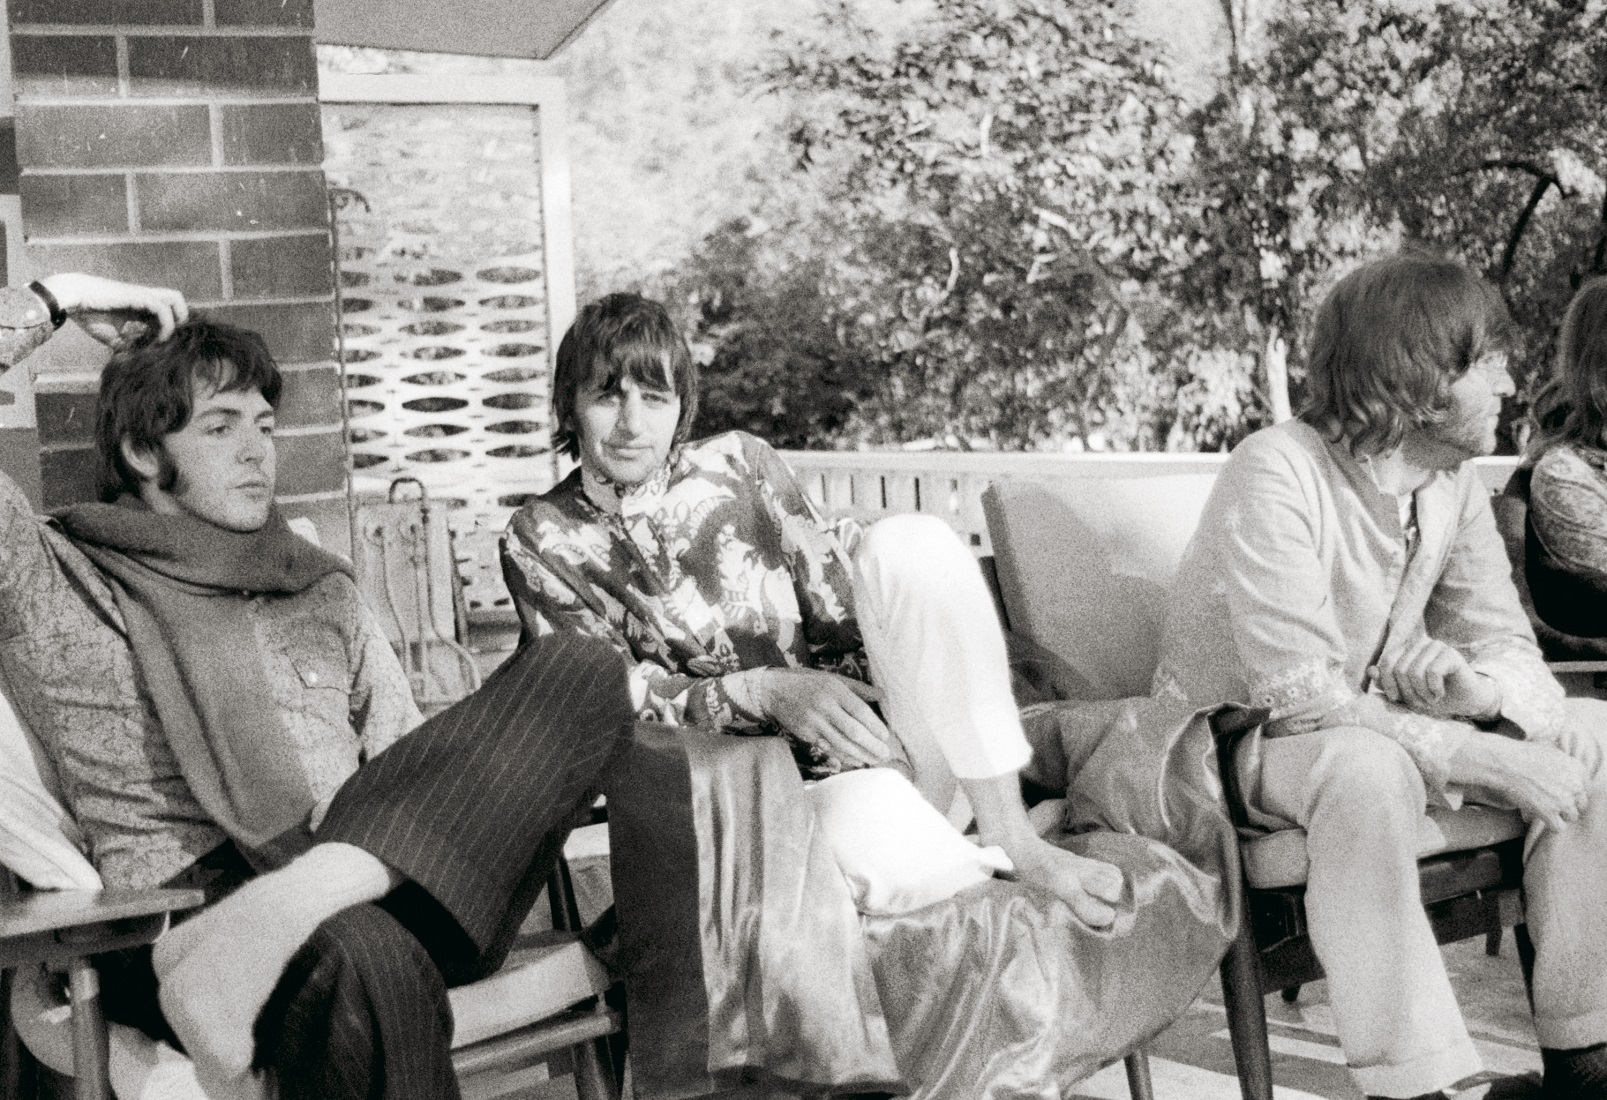 Il Museo d'Arte Orientale di Torino mette in mostra i mi(s)tici Beatles